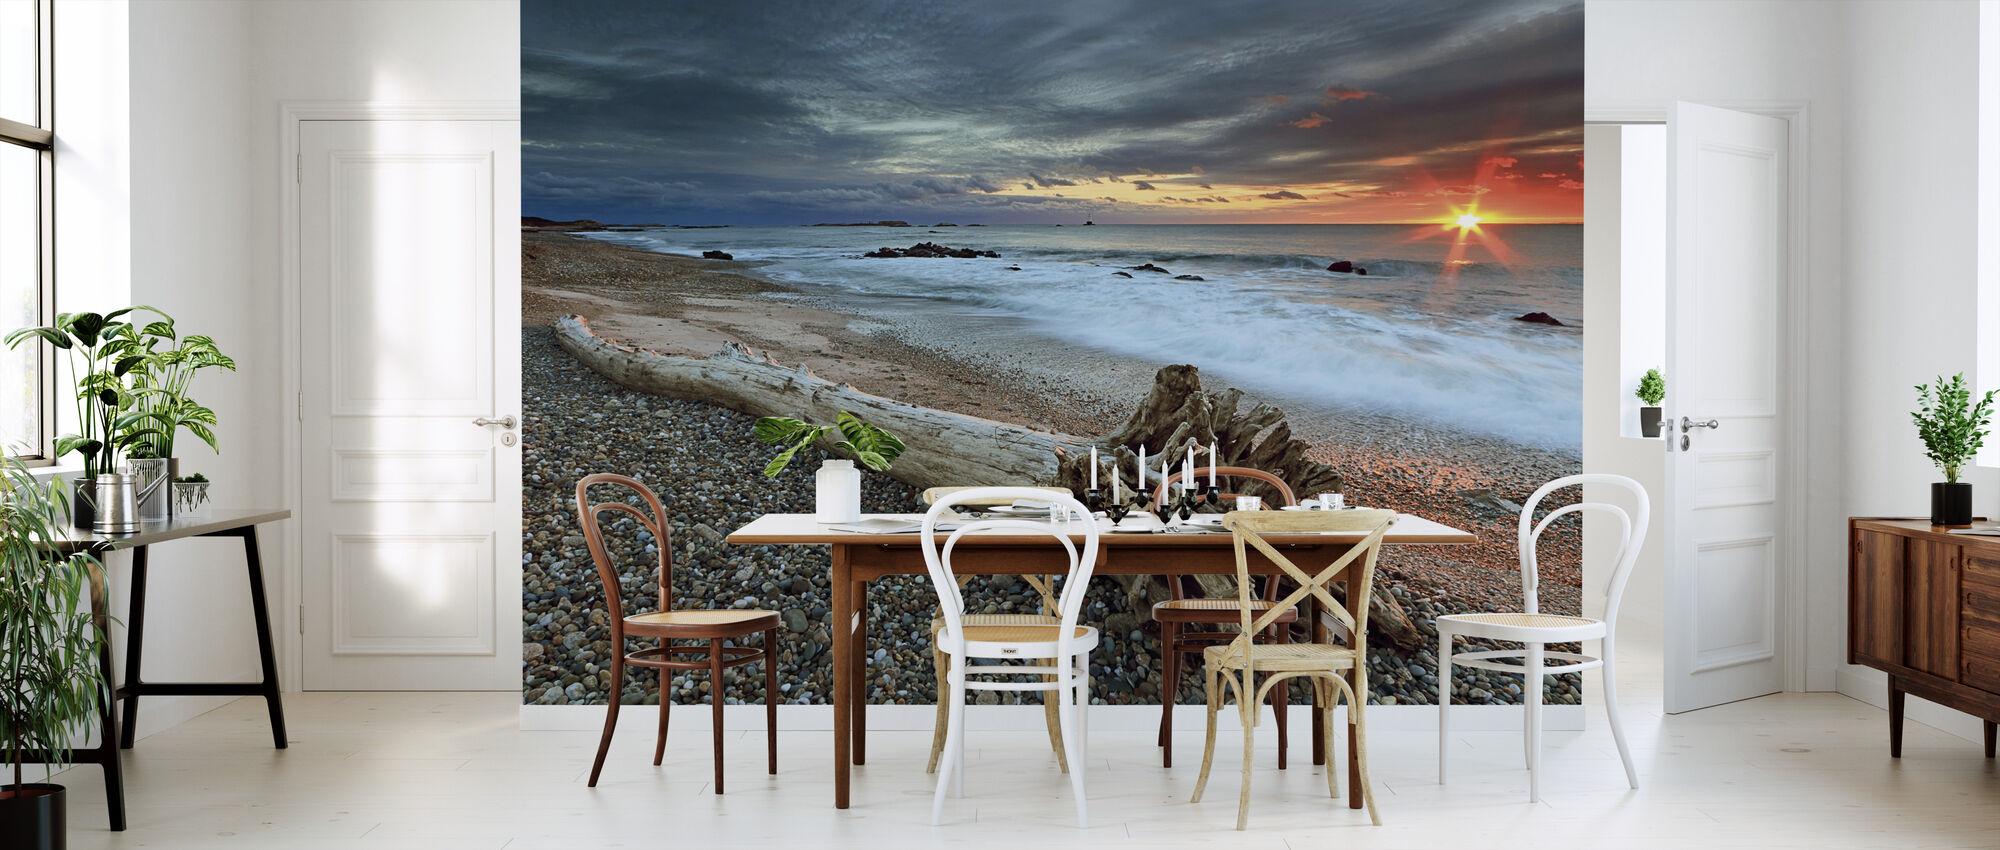 sakonnet driftwood mit fototapeten einrichten photowall. Black Bedroom Furniture Sets. Home Design Ideas